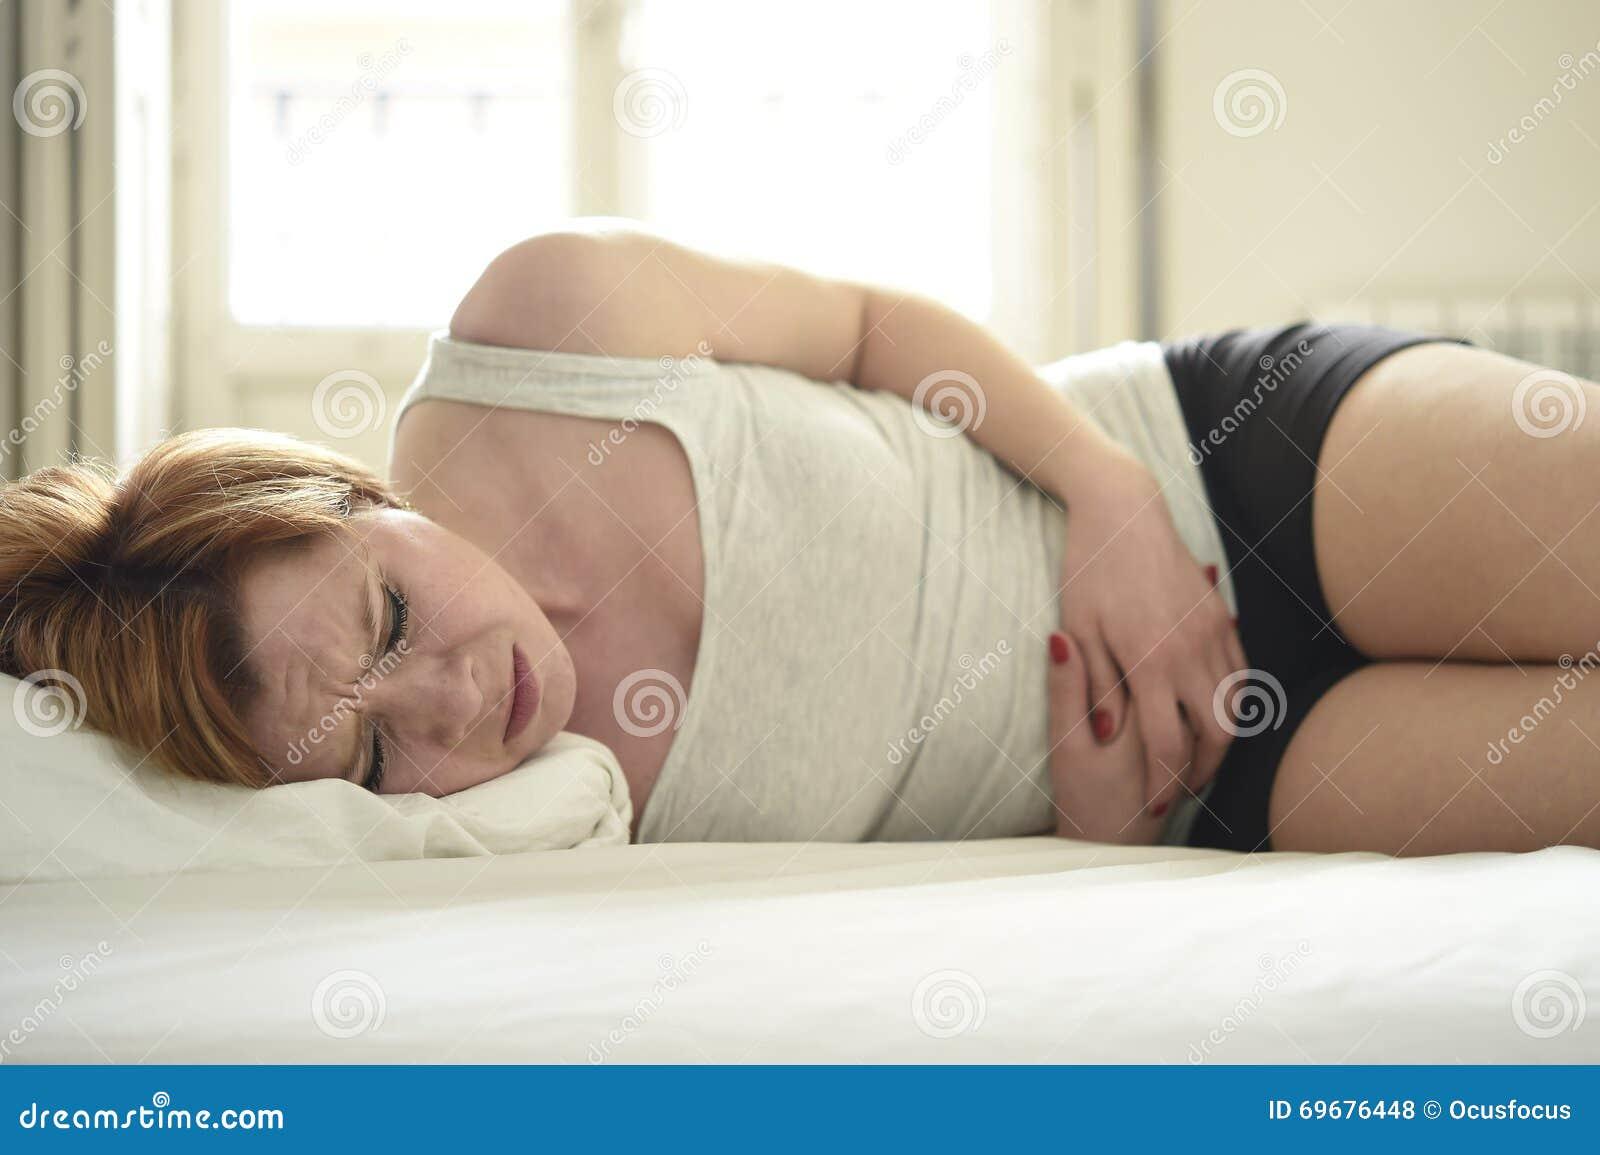 videos girl menstruating in bed